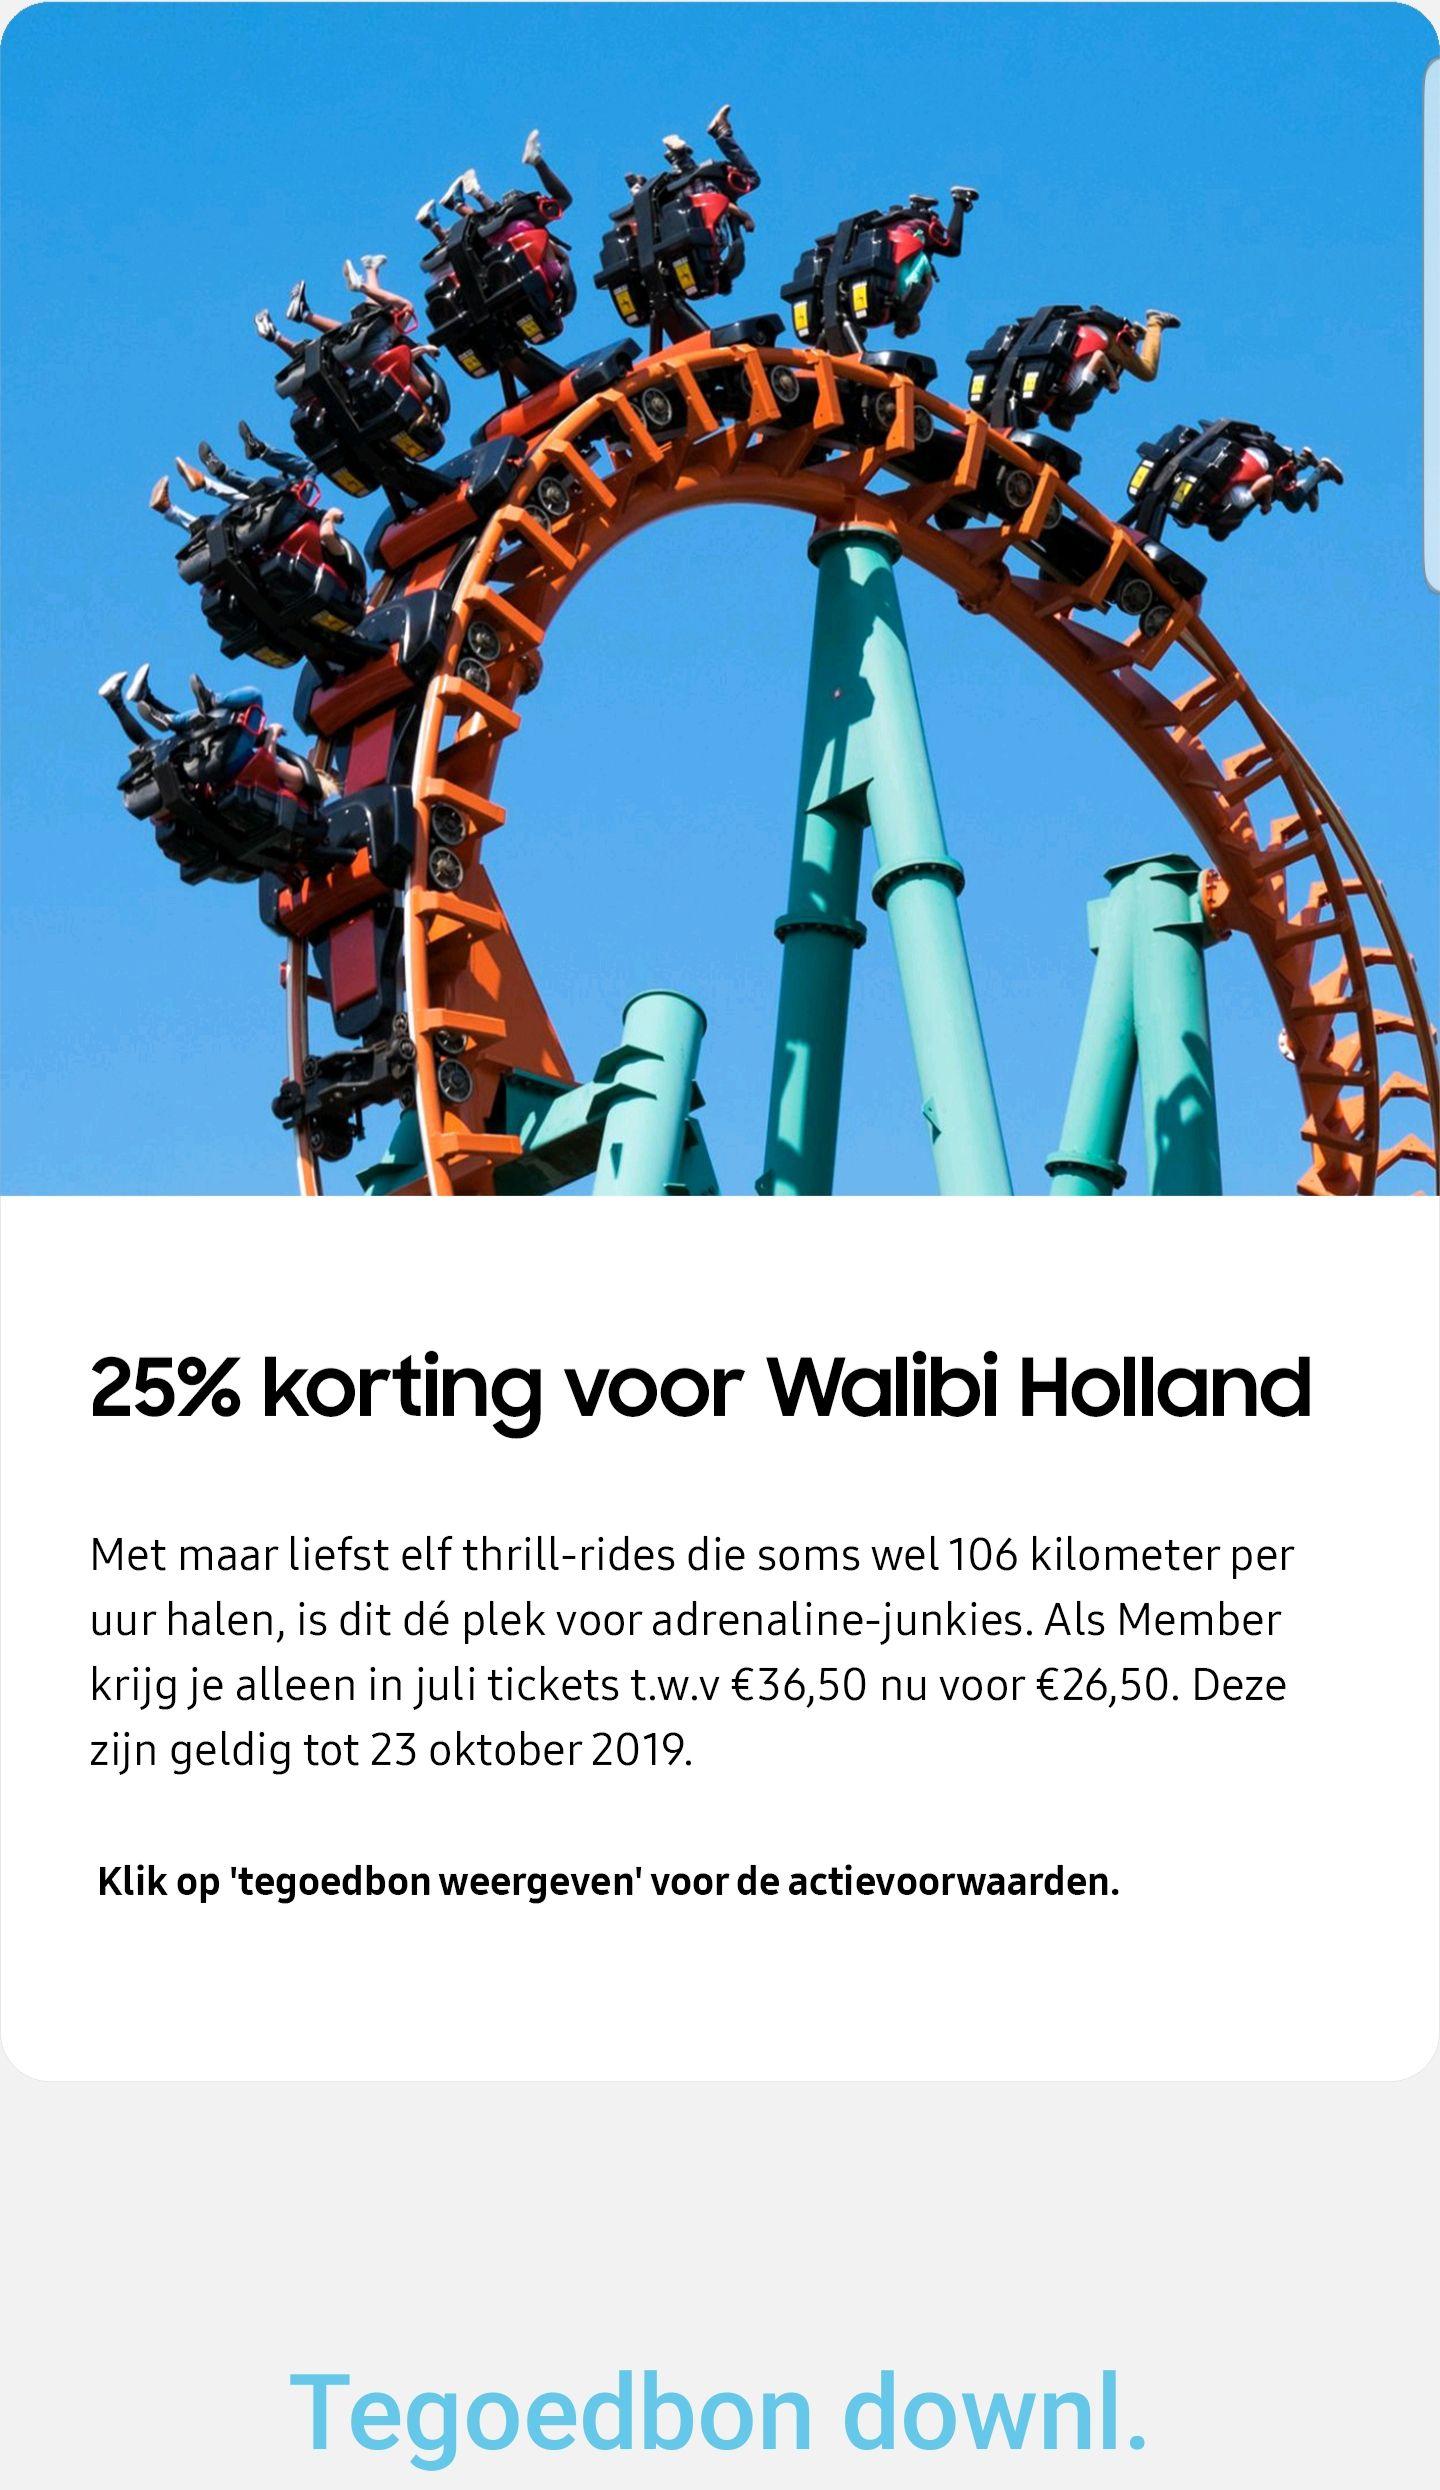 25% korting bij Walibi Holland @ Samsung members app